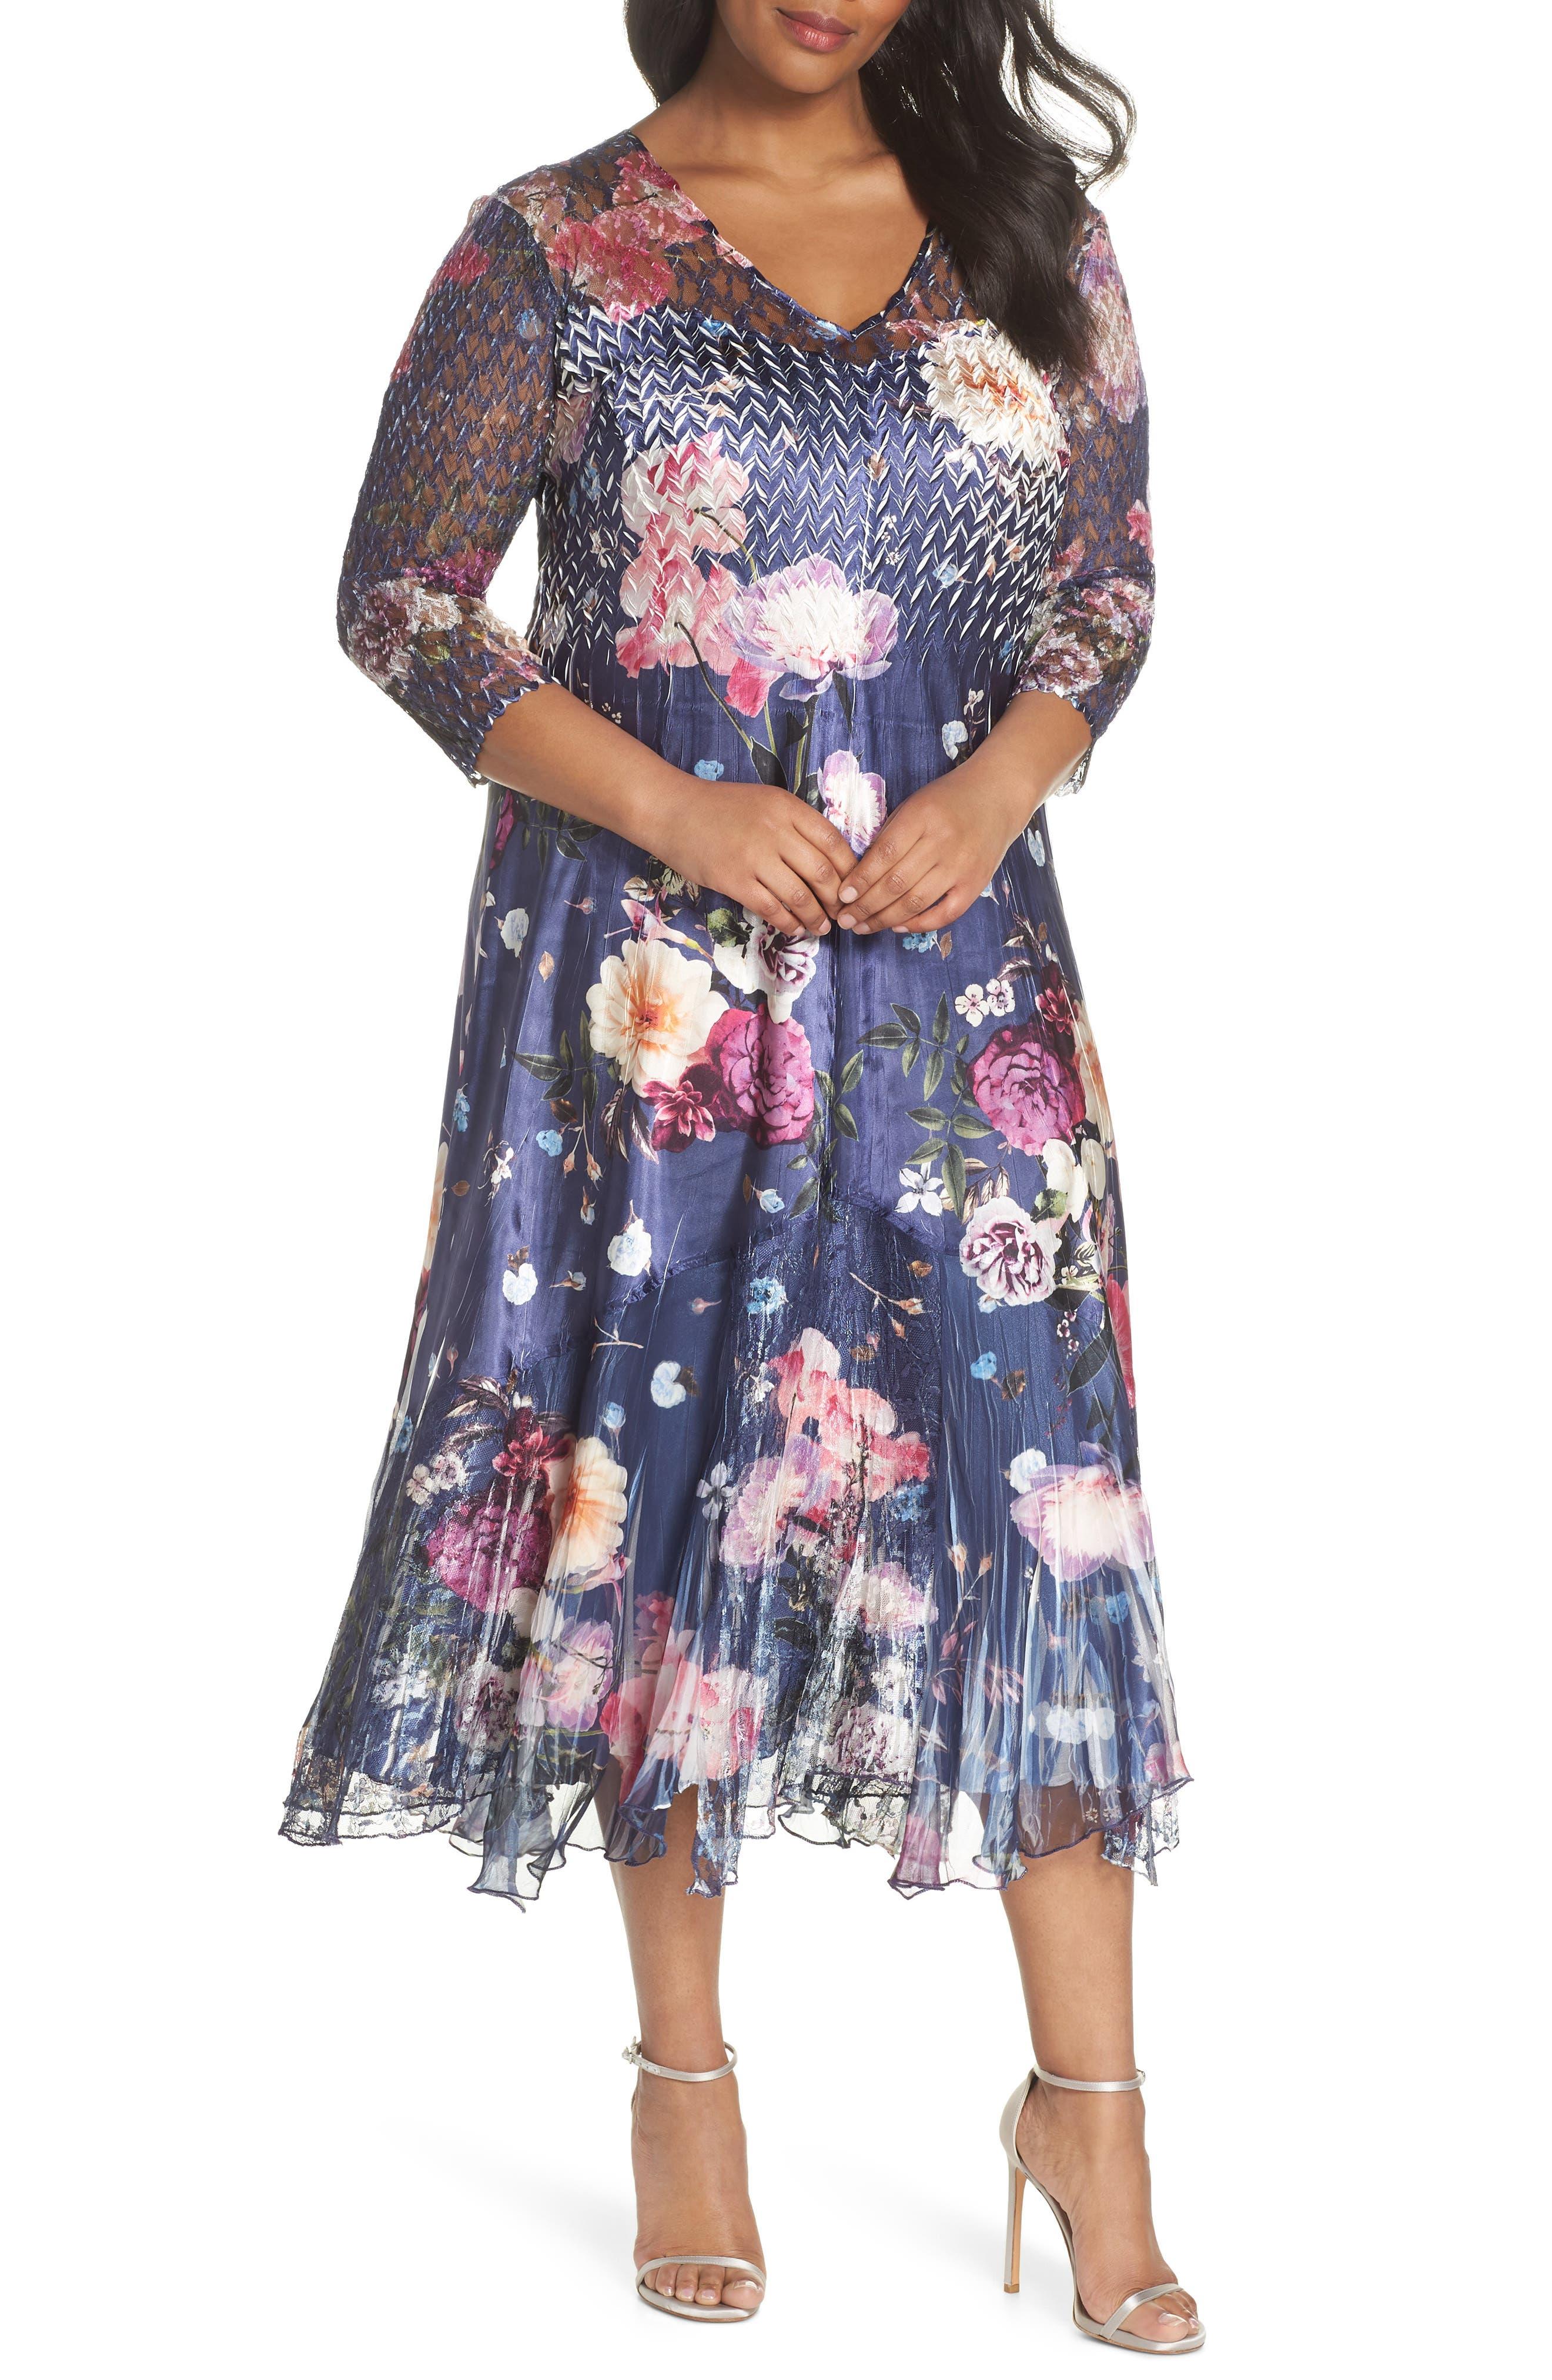 Koramov Floral Print Lace Inset Dress,                         Main,                         color, 500